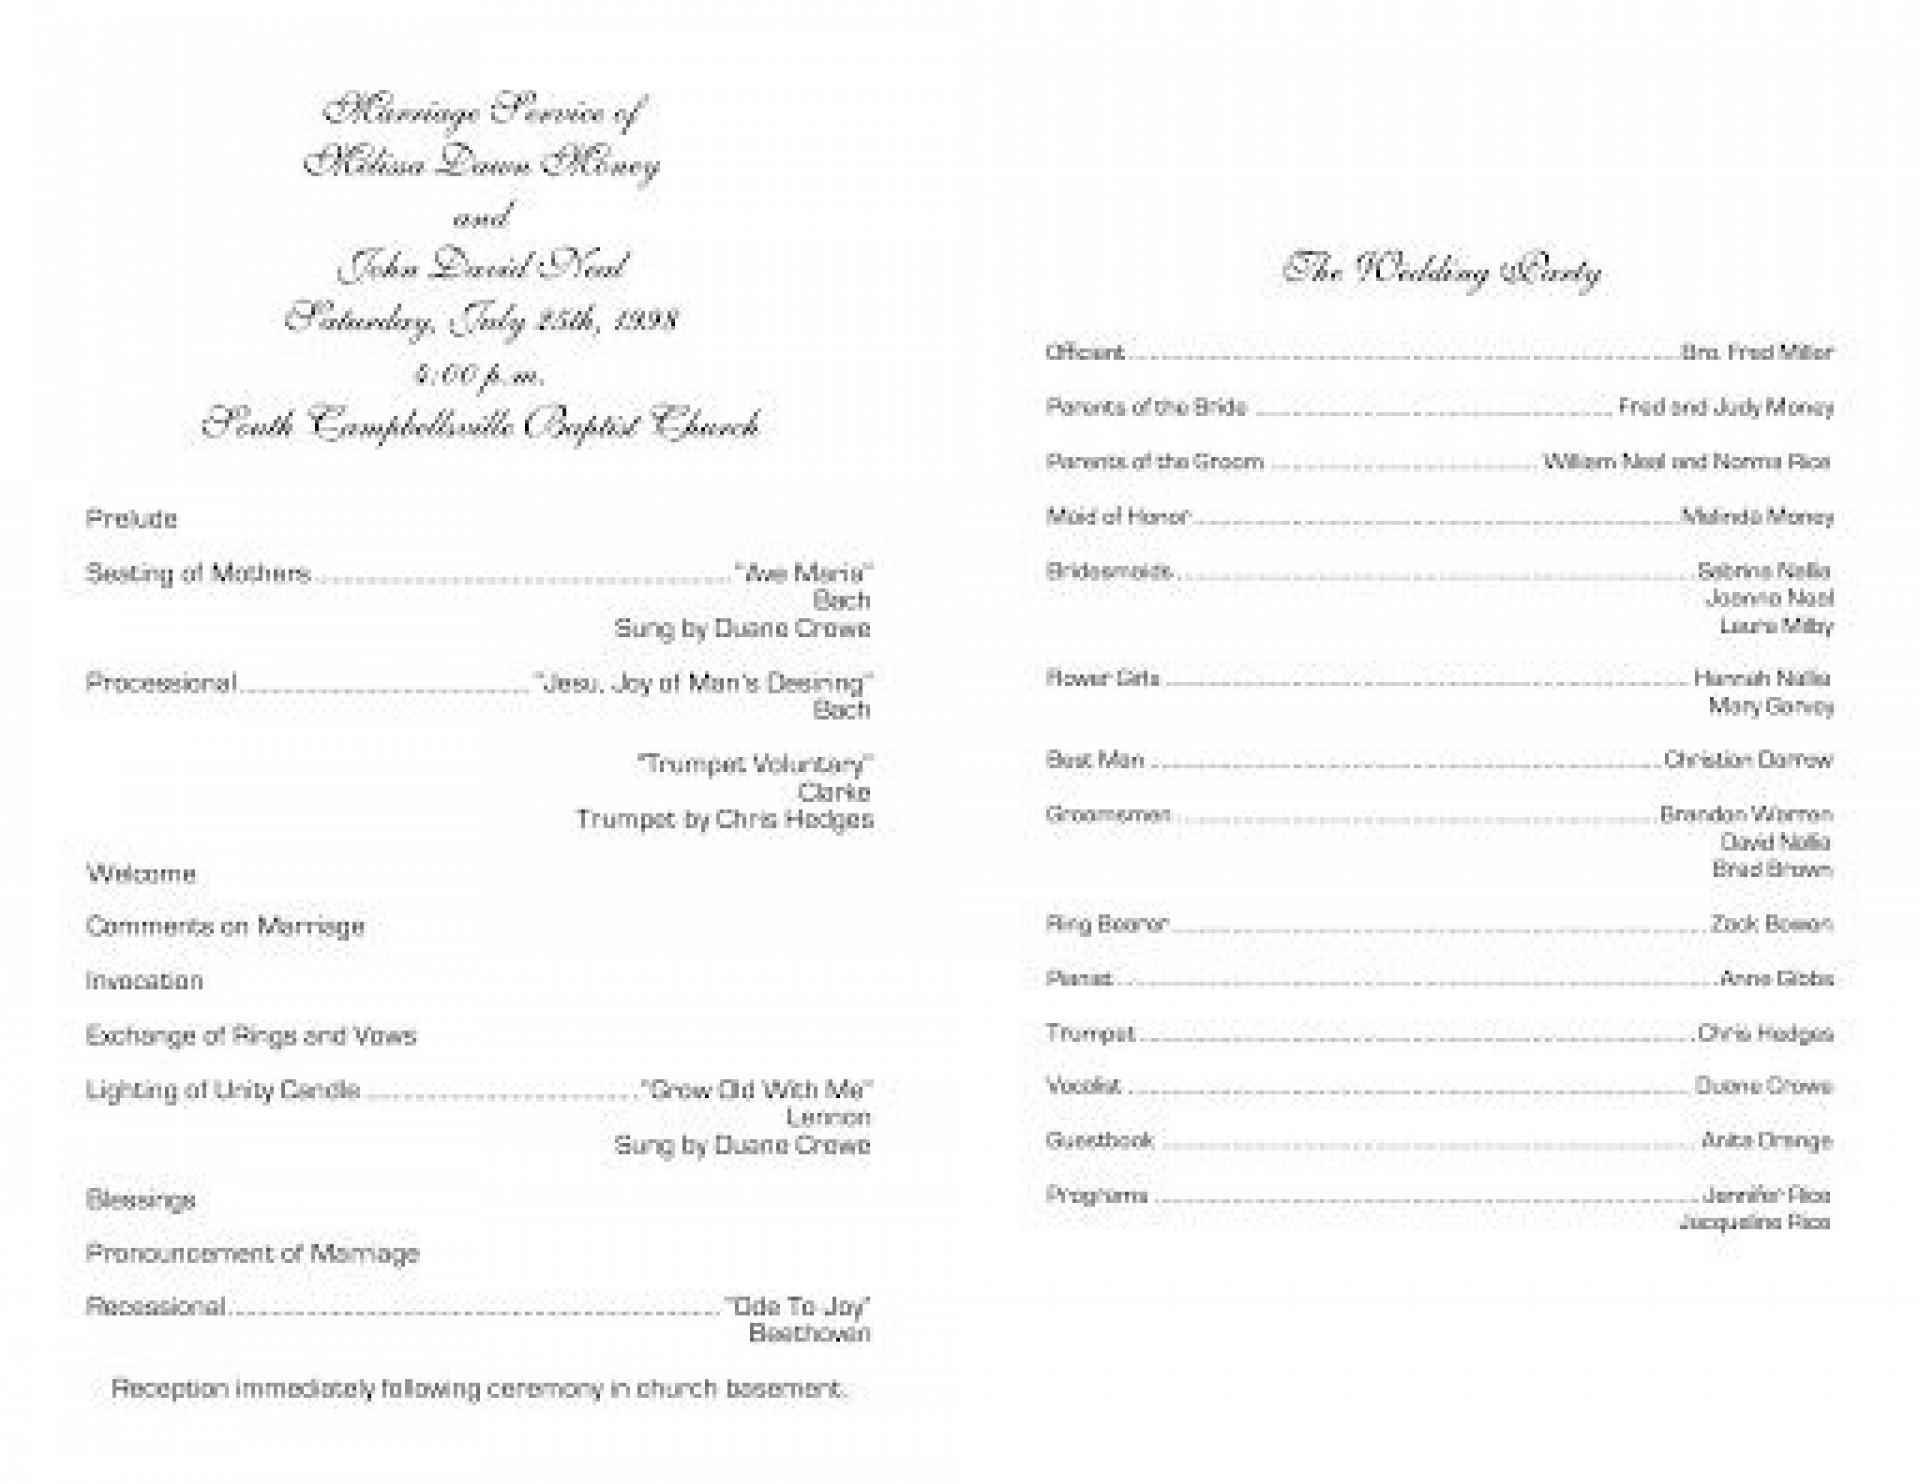 009 Fantastic Free Church Program Template Photo  Printable Anniversary Doc1920